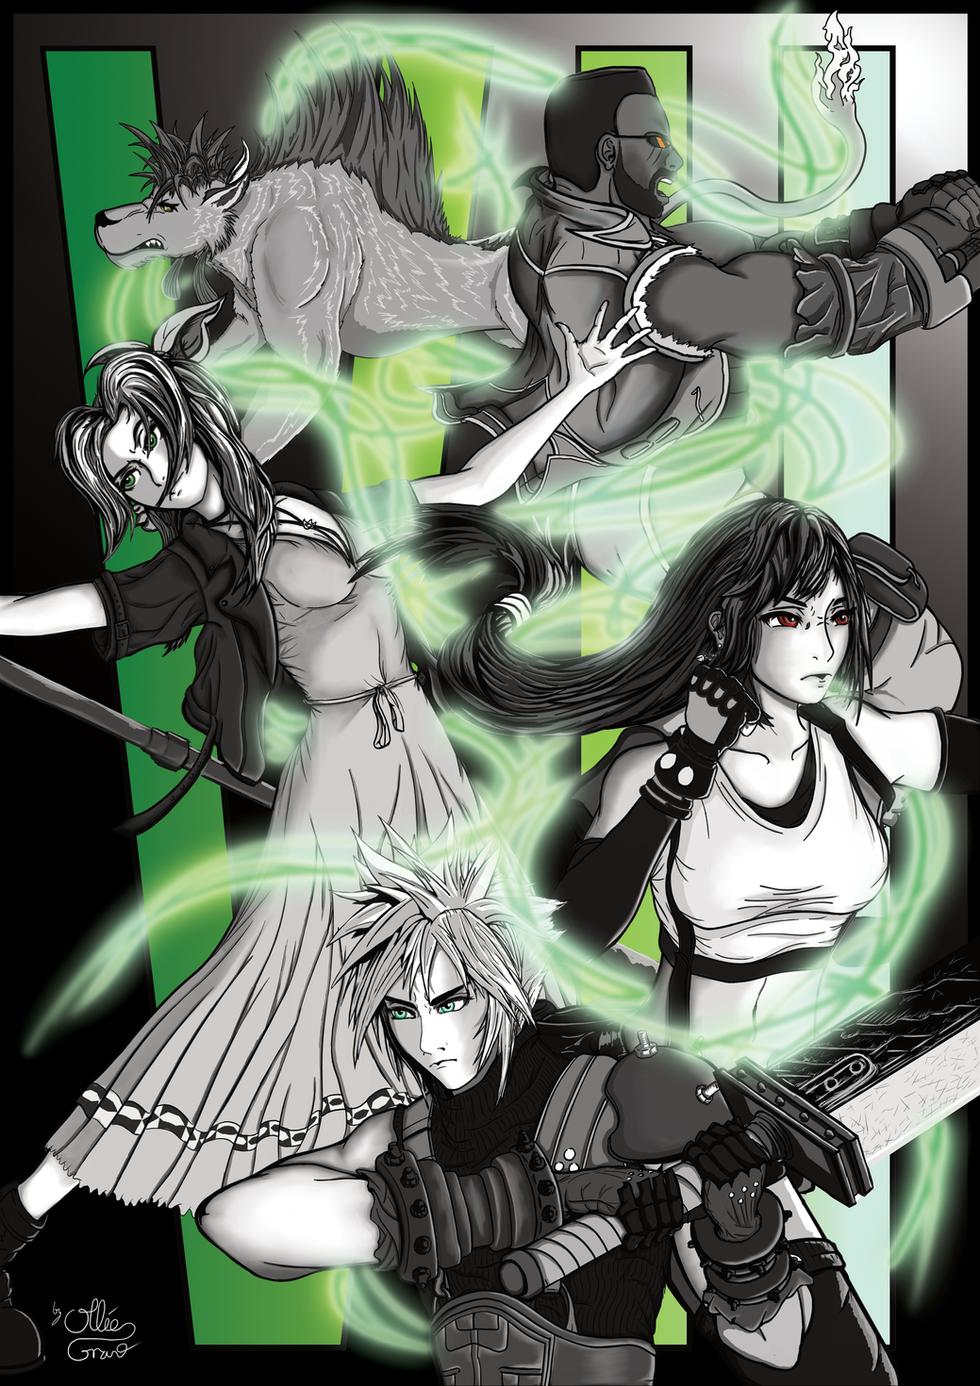 Final Fantasy 7 Remake Fan Art Poster